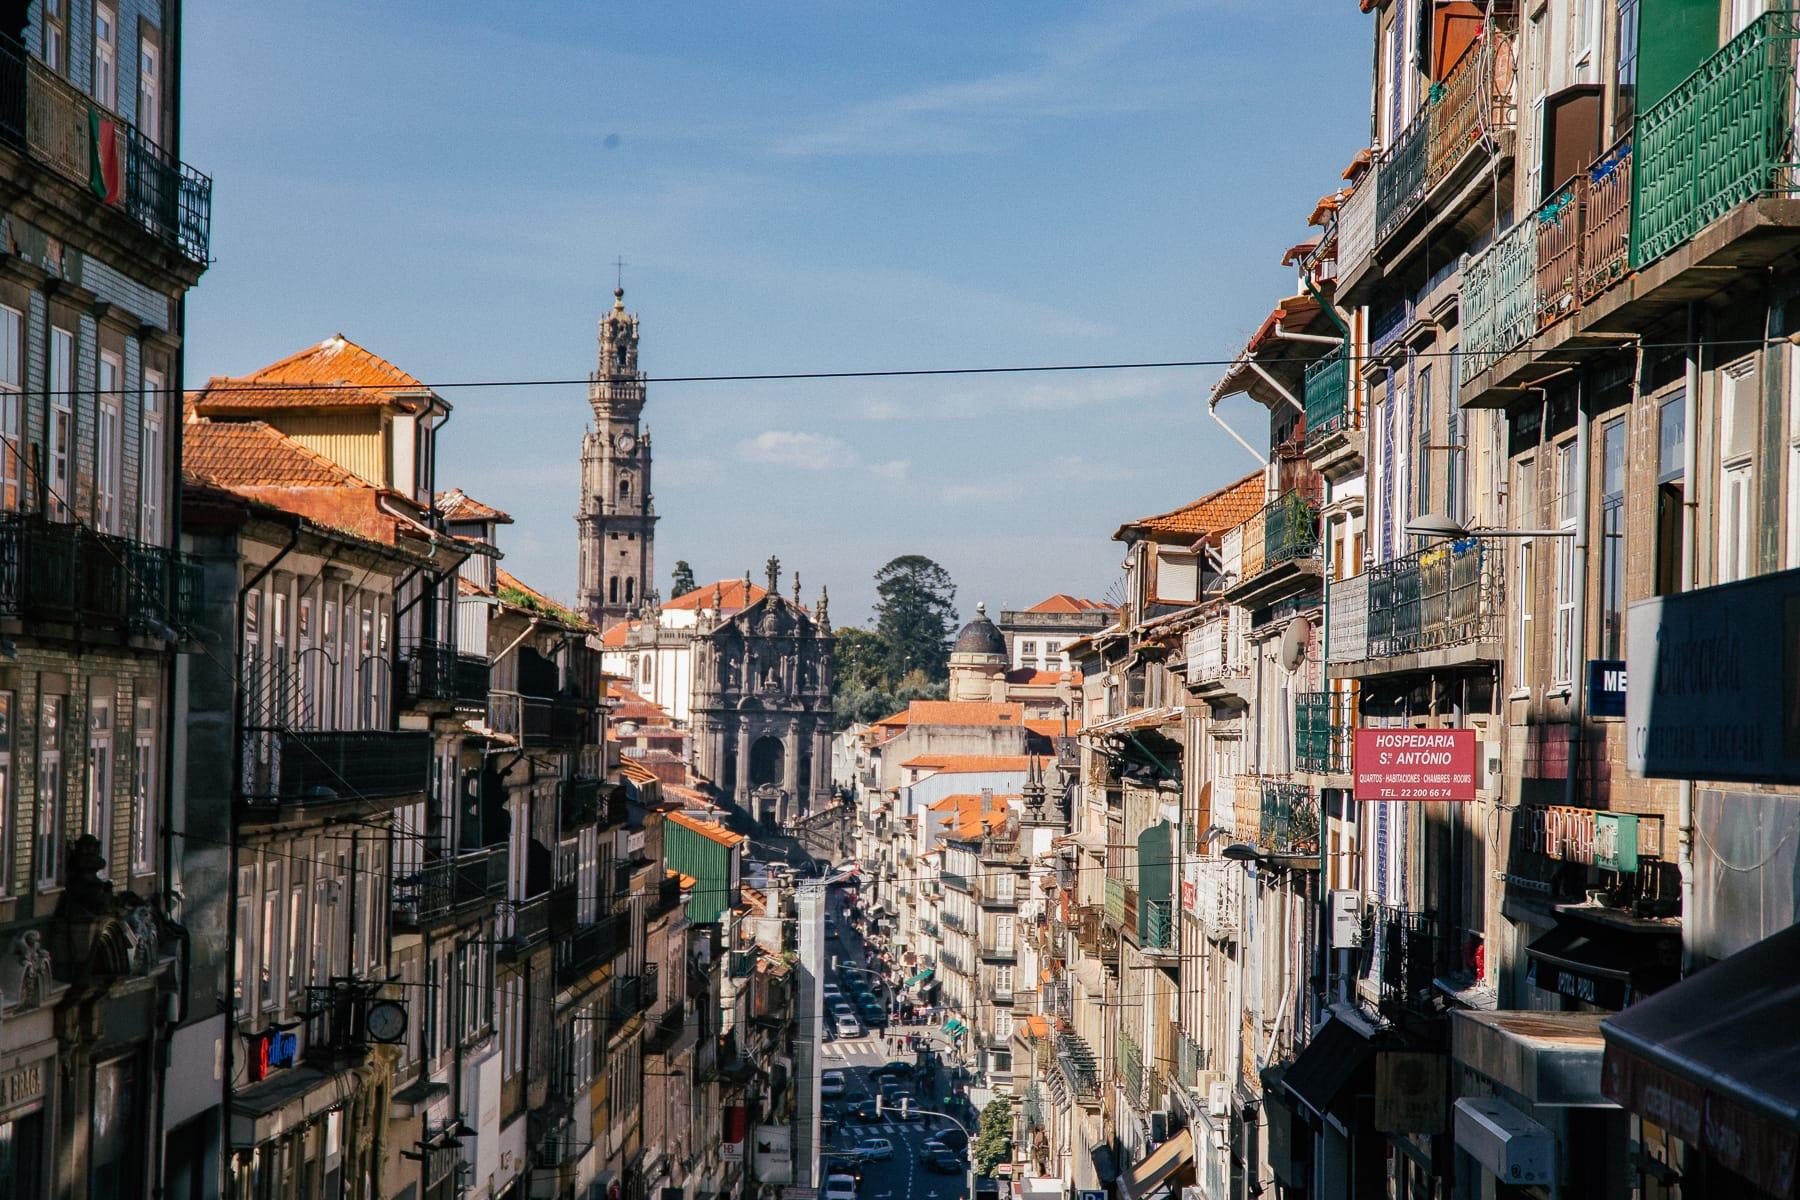 zehn-porto-tipps-fuer-deine-staedtereise-in-portugal-reiseblog-des-belles-choses 6